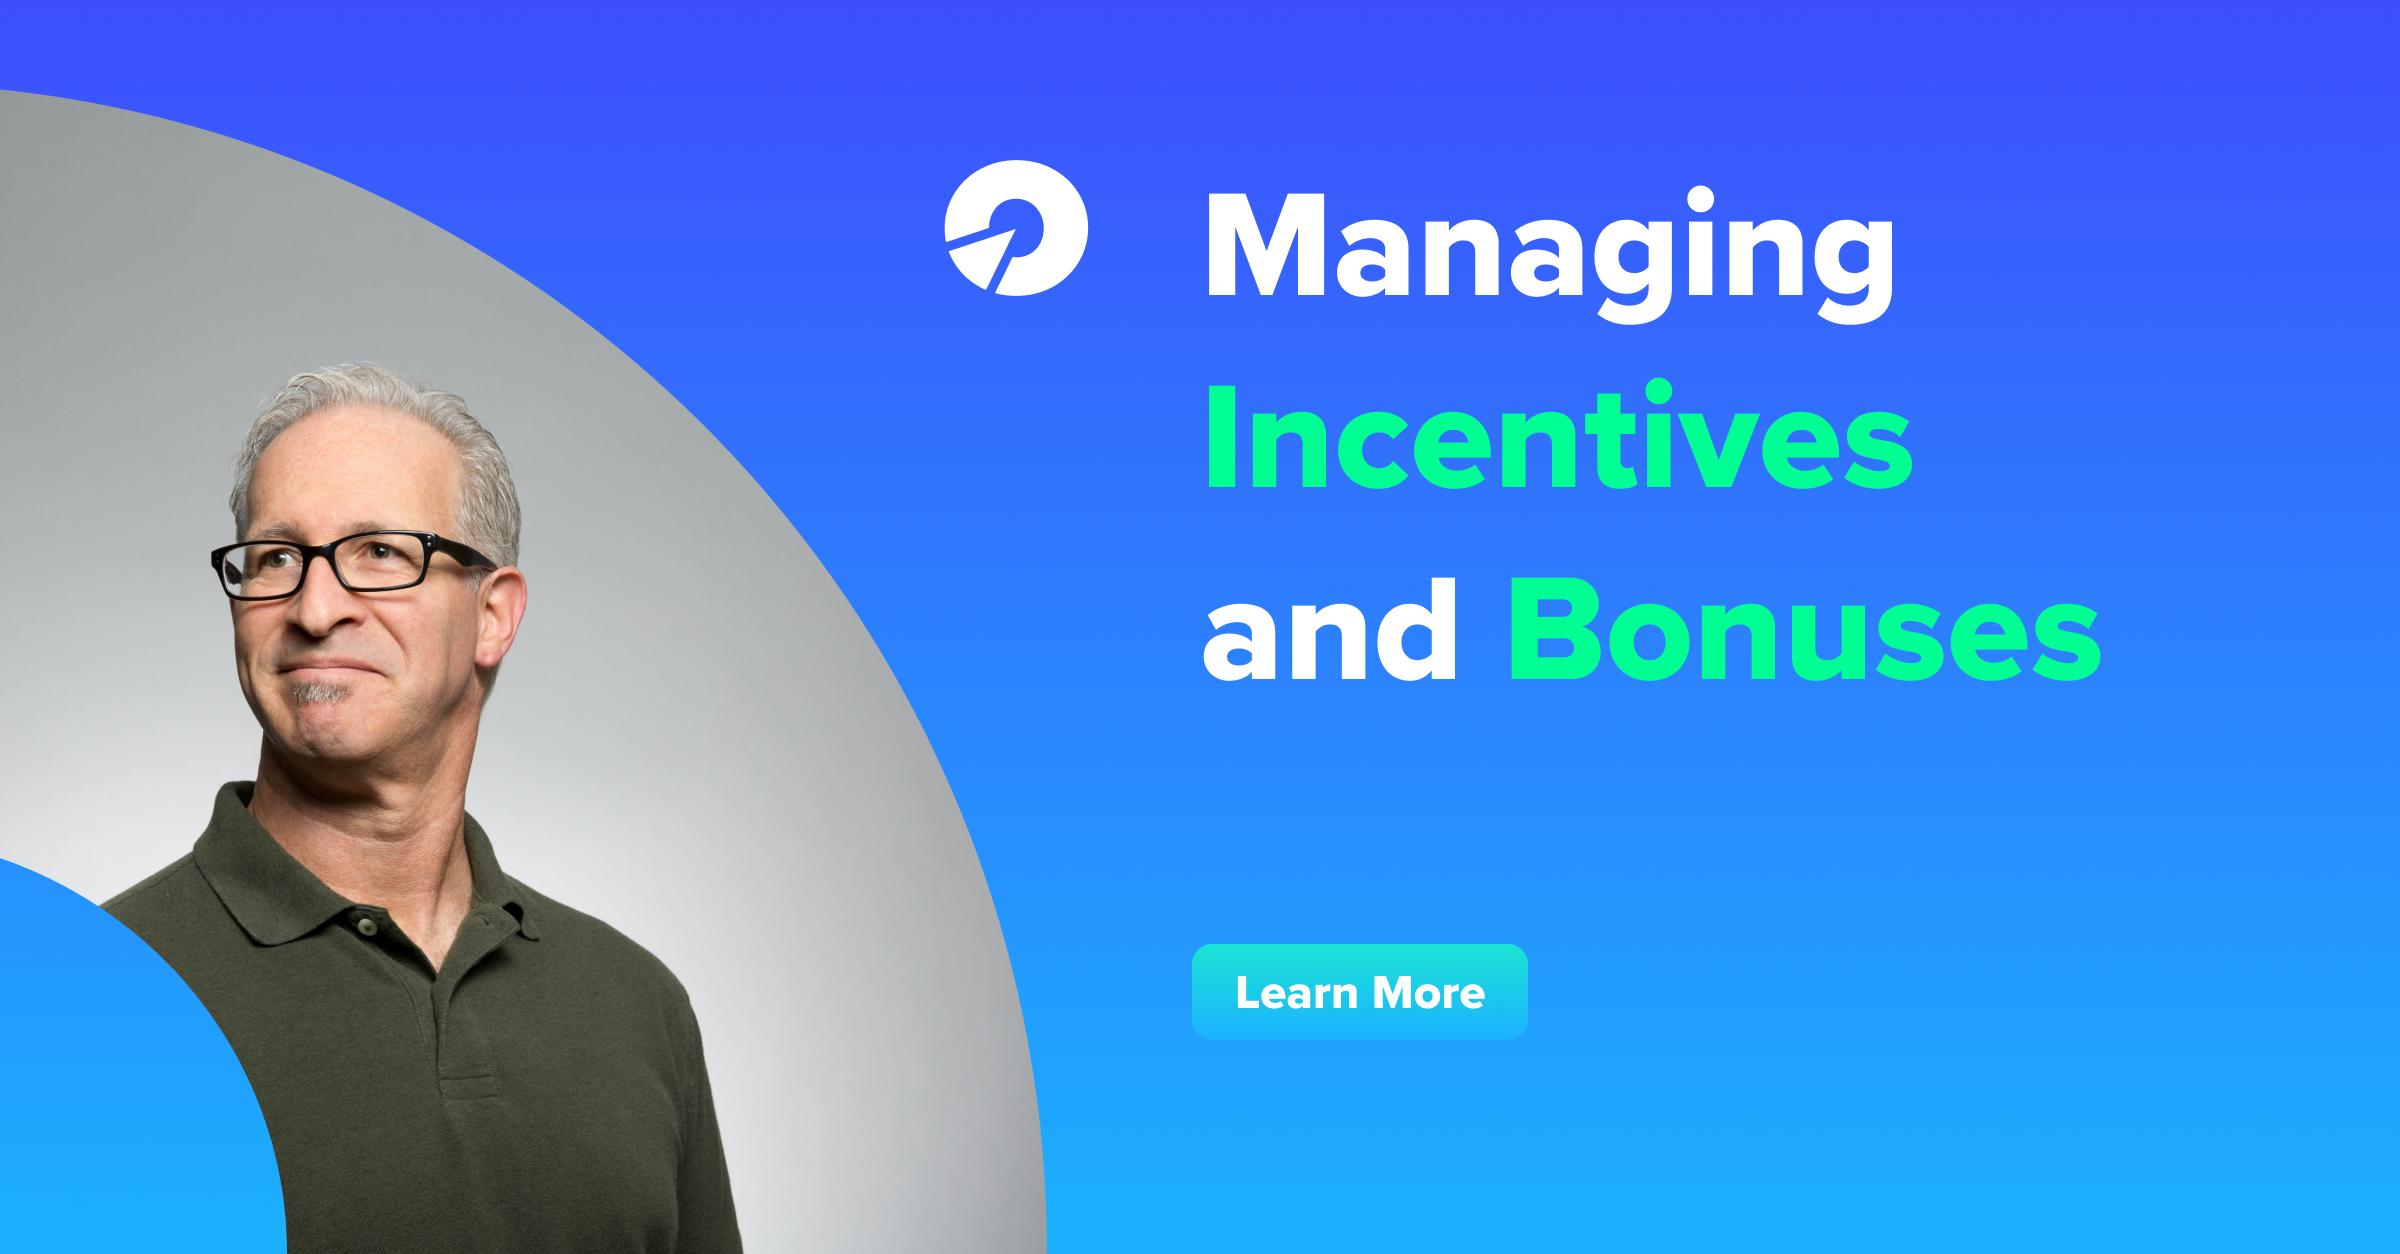 Managing Incentives and Bonuses